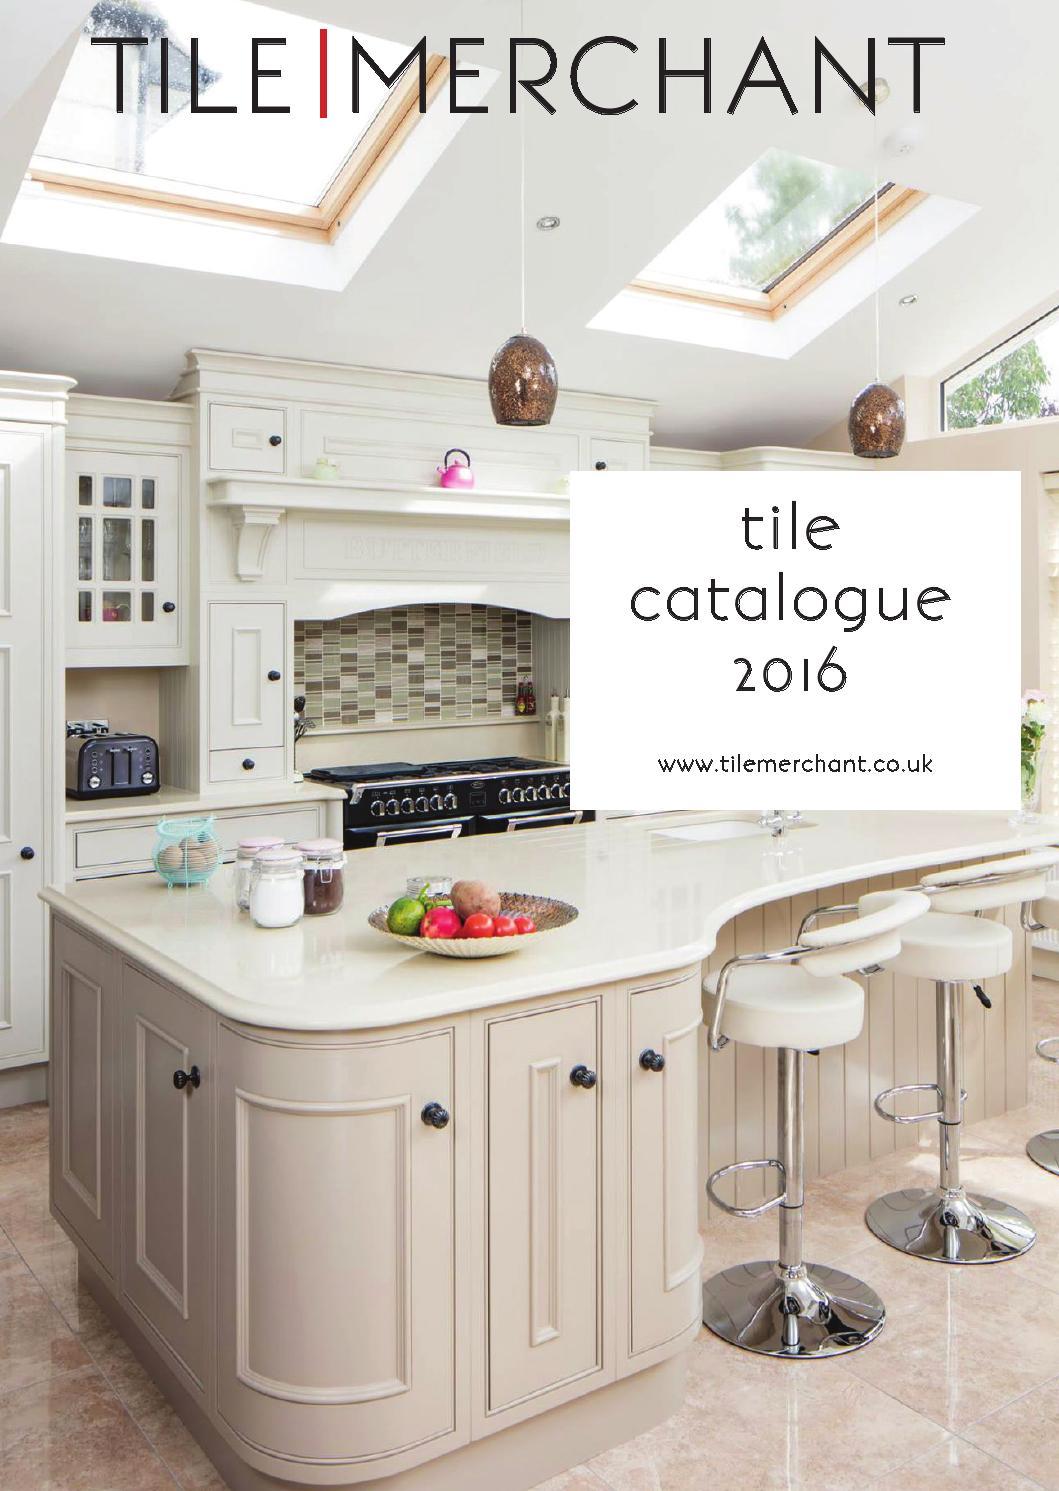 Kitchen Tiles Catalogue tile catalogue uk 2016stone merchant - issuu